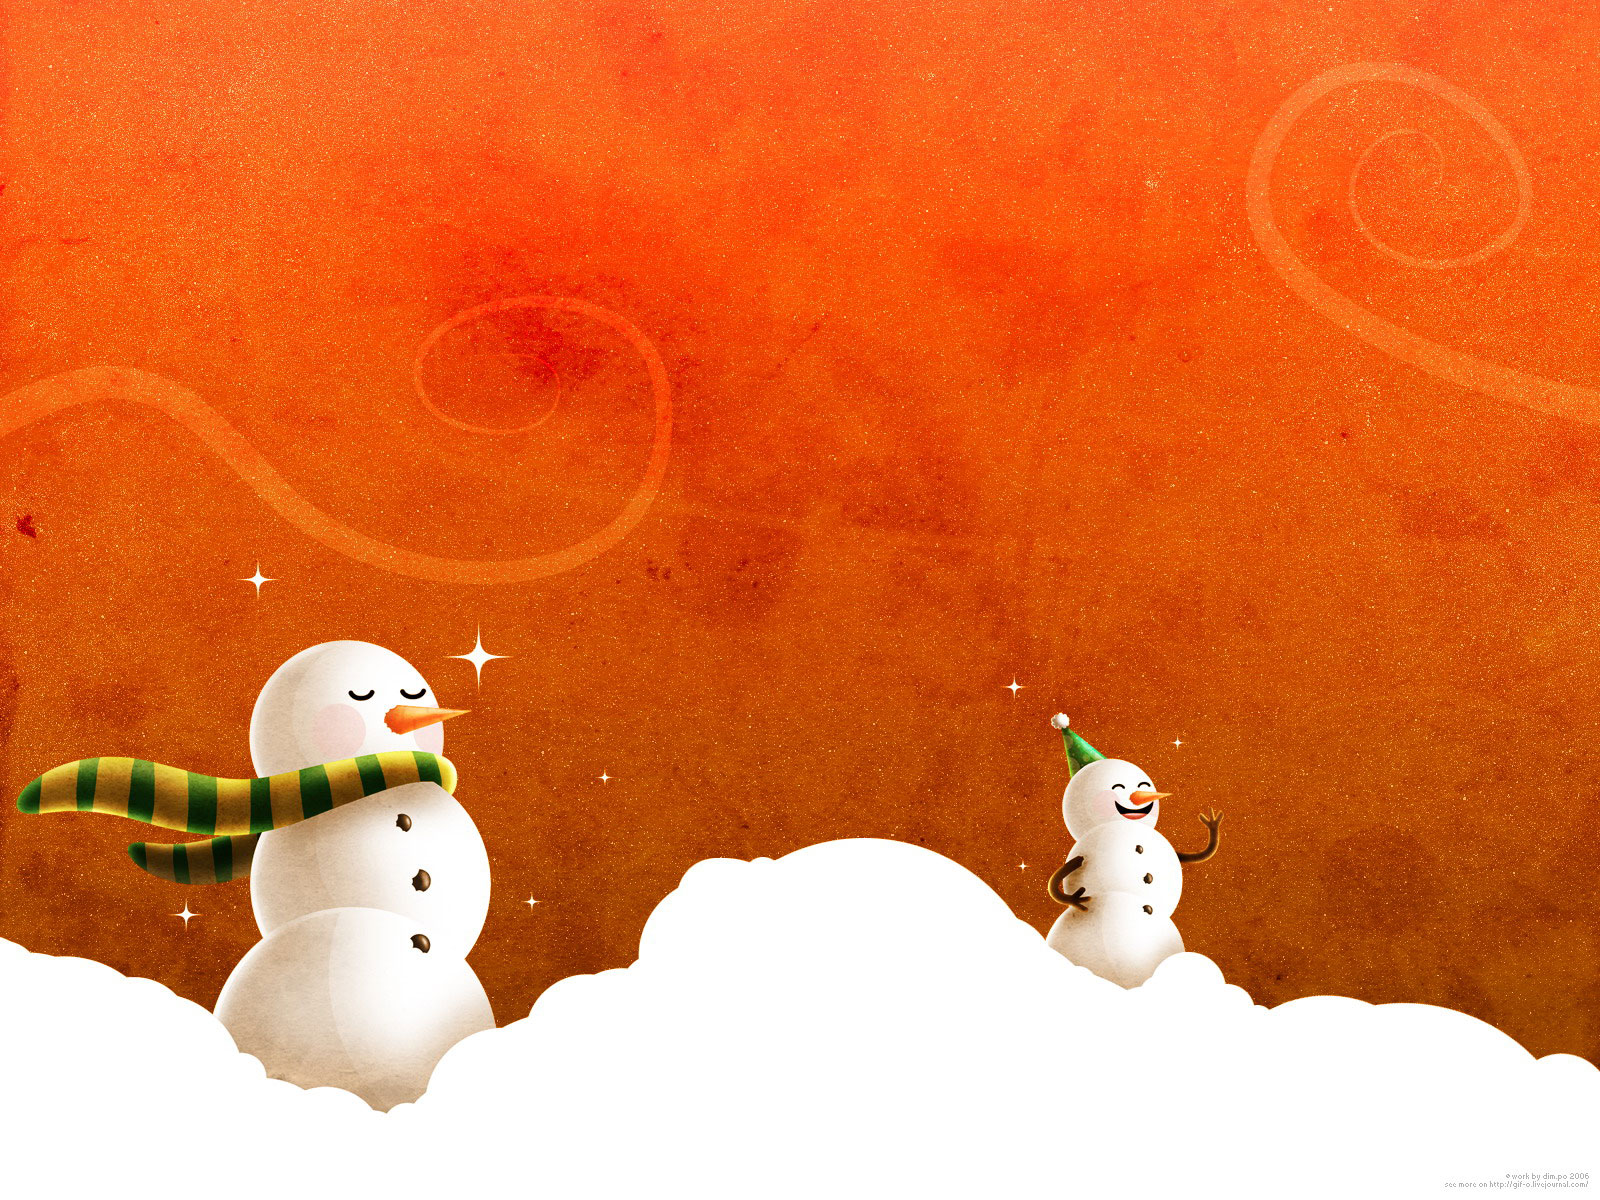 Christmas Cartoon Wallpapers 1600x1200